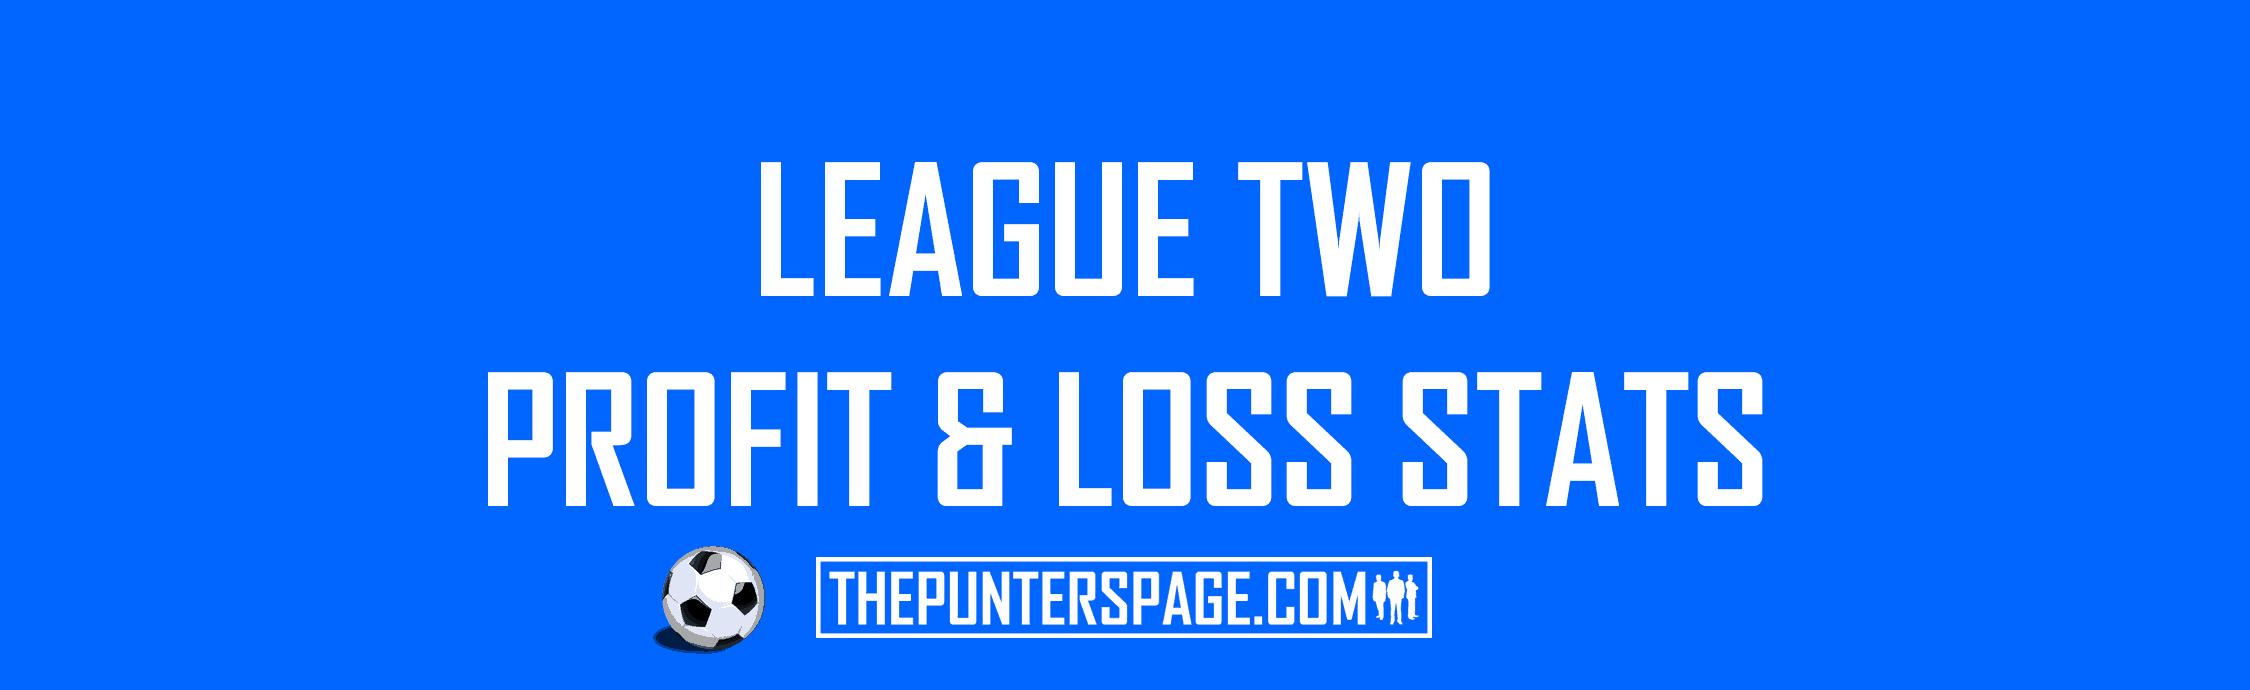 English League Two Profit & Loss Statistics